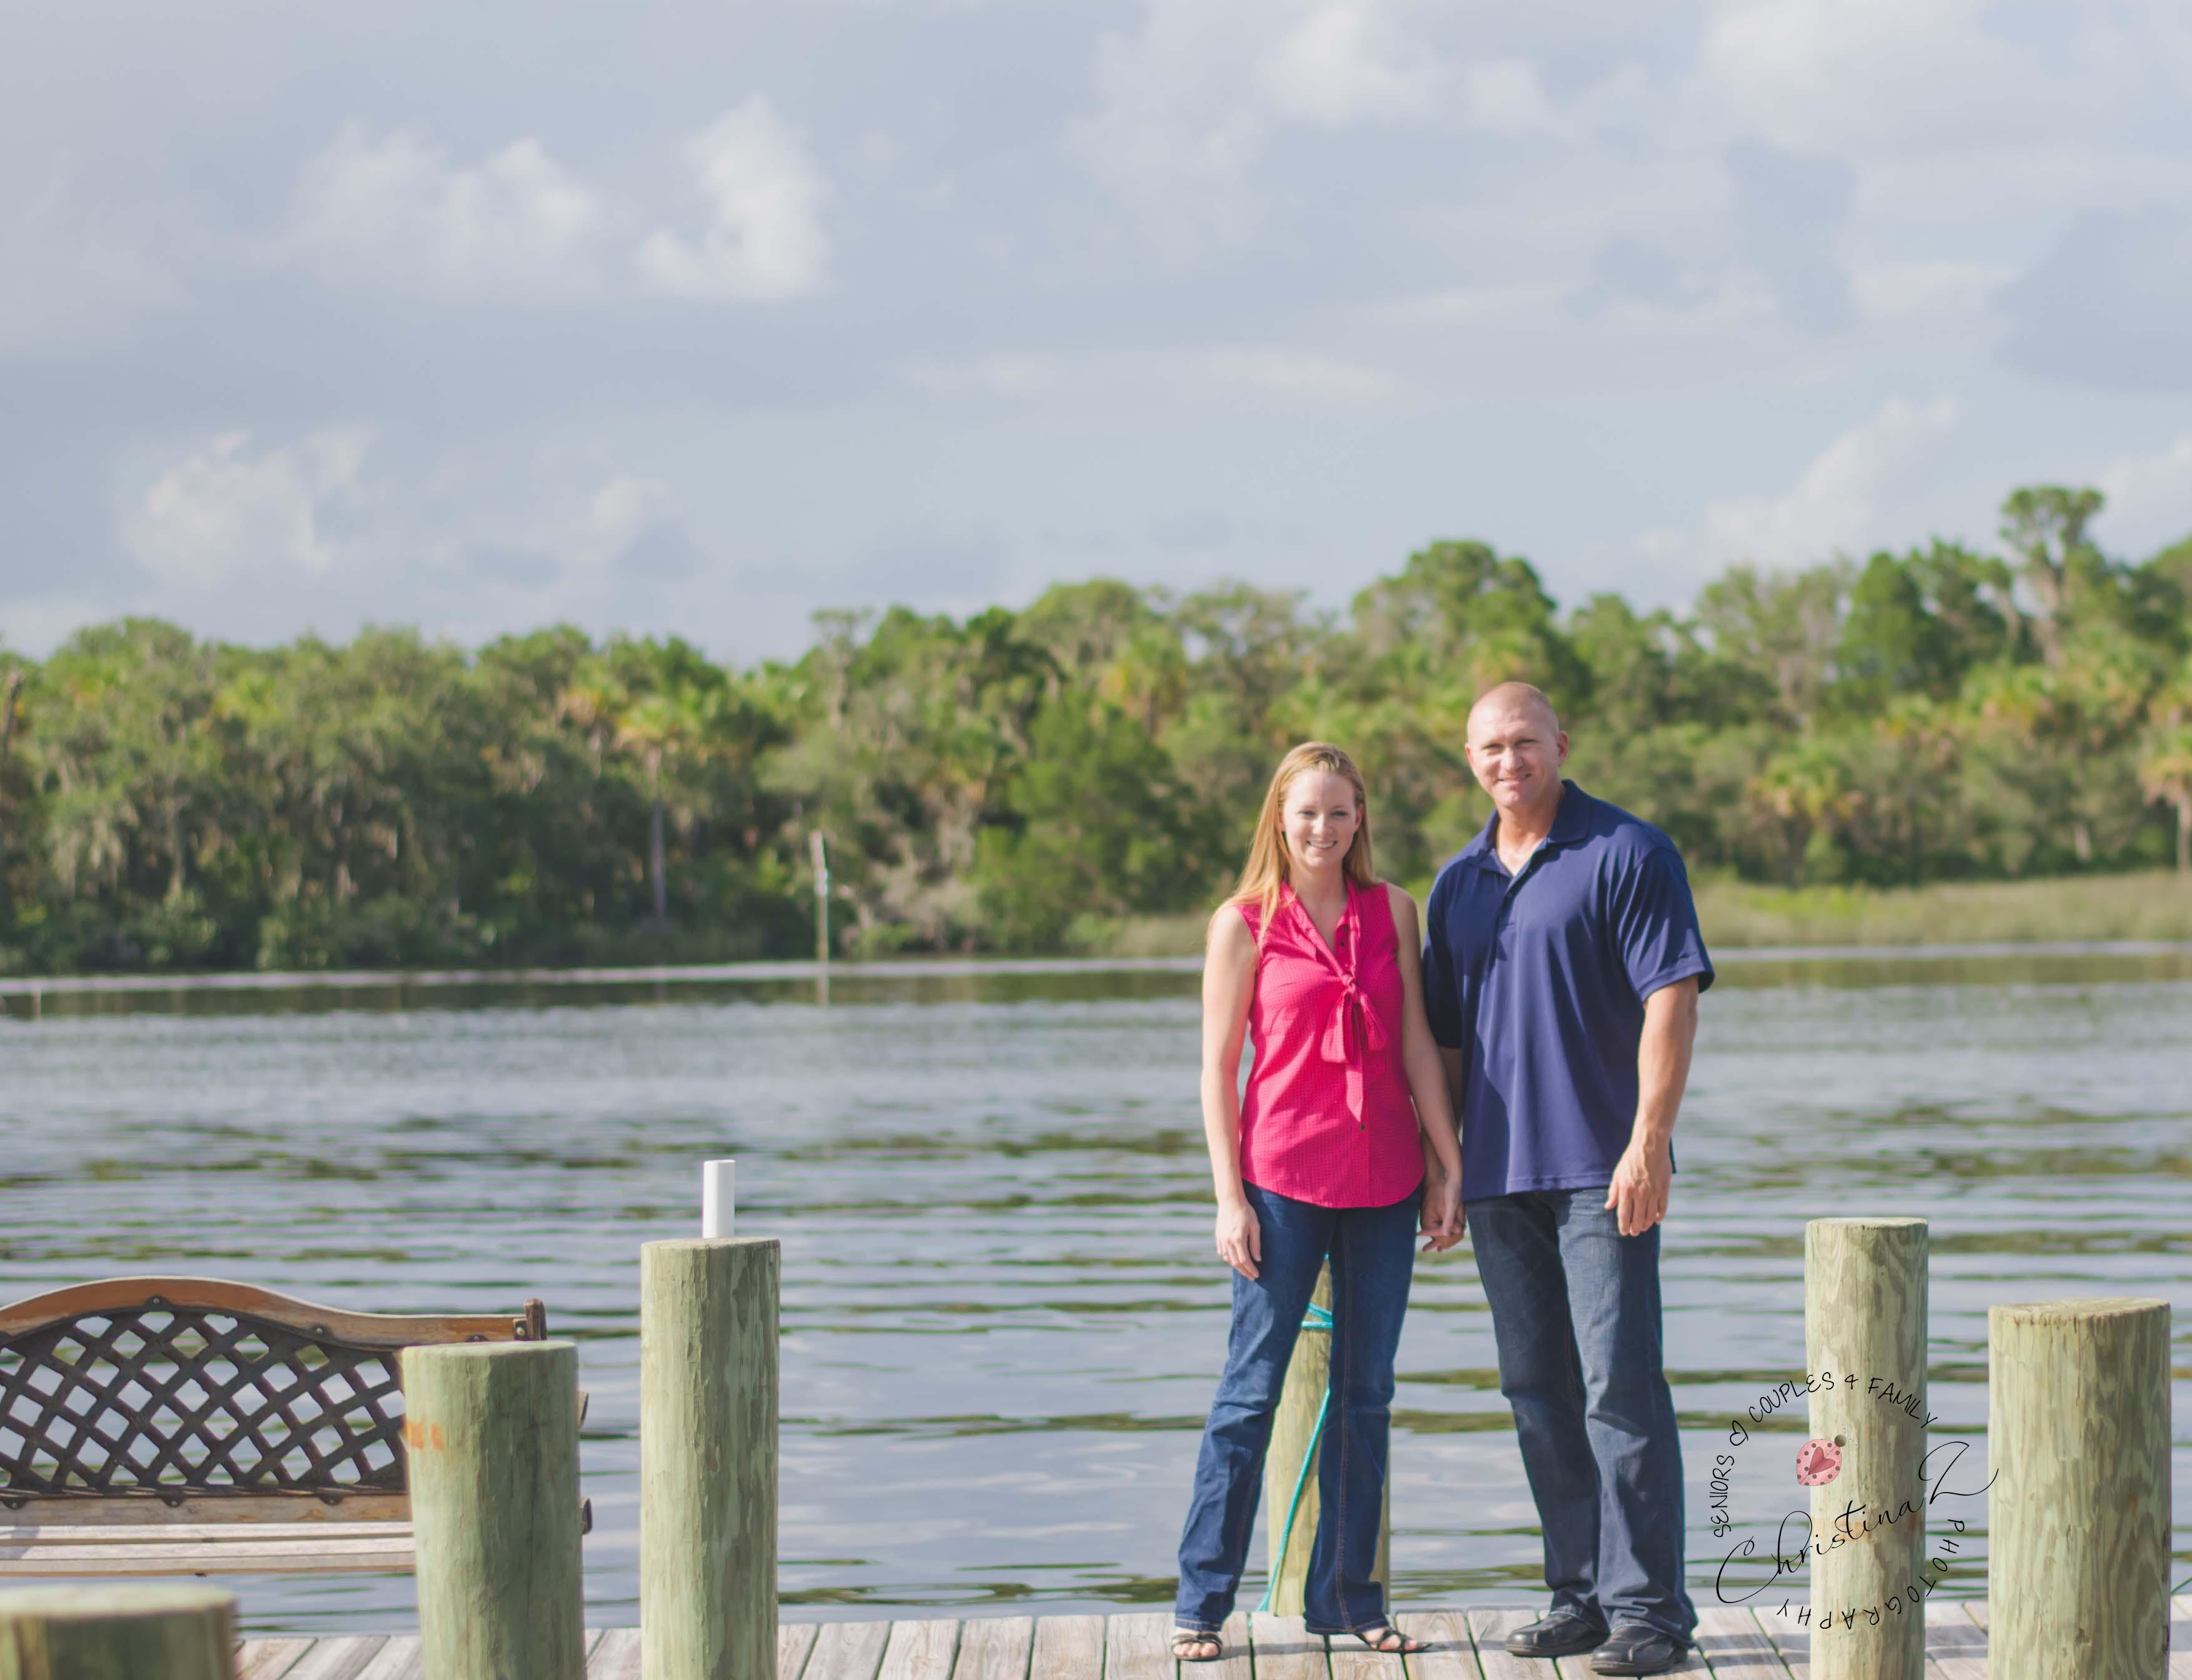 Candy + Jeff | Engagement Photography | Christina Z Photography © 2013 - Bradenton, FL